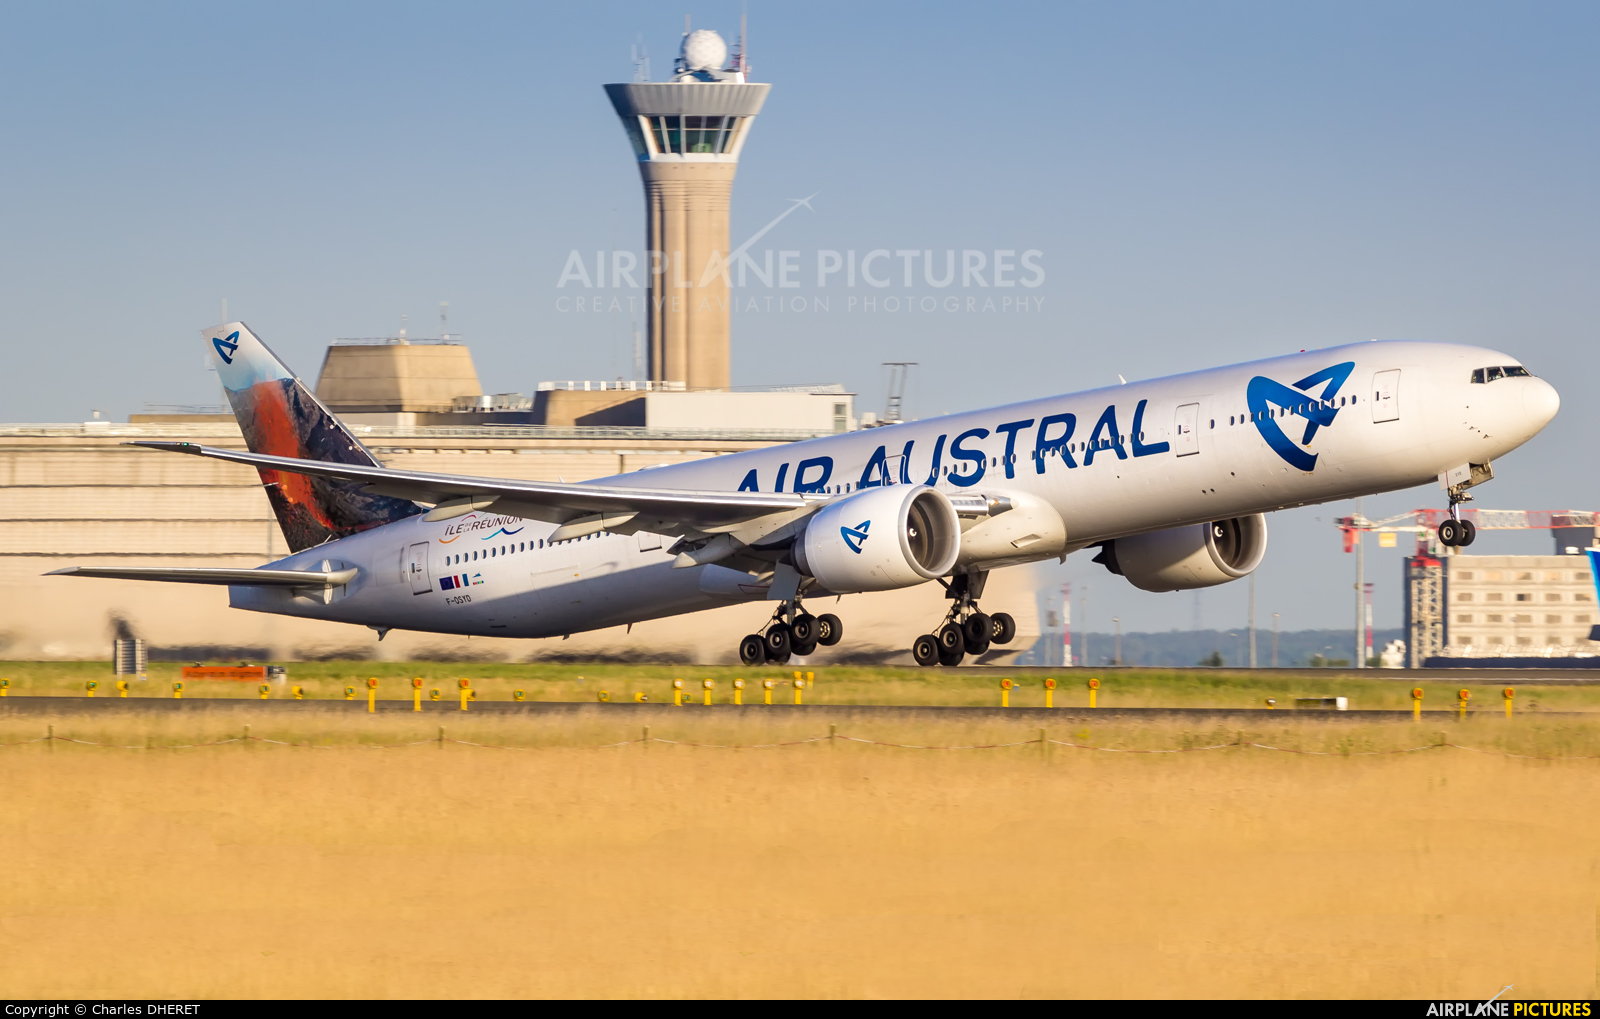 Air Austral F-OSYD aircraft at Paris - Charles de Gaulle